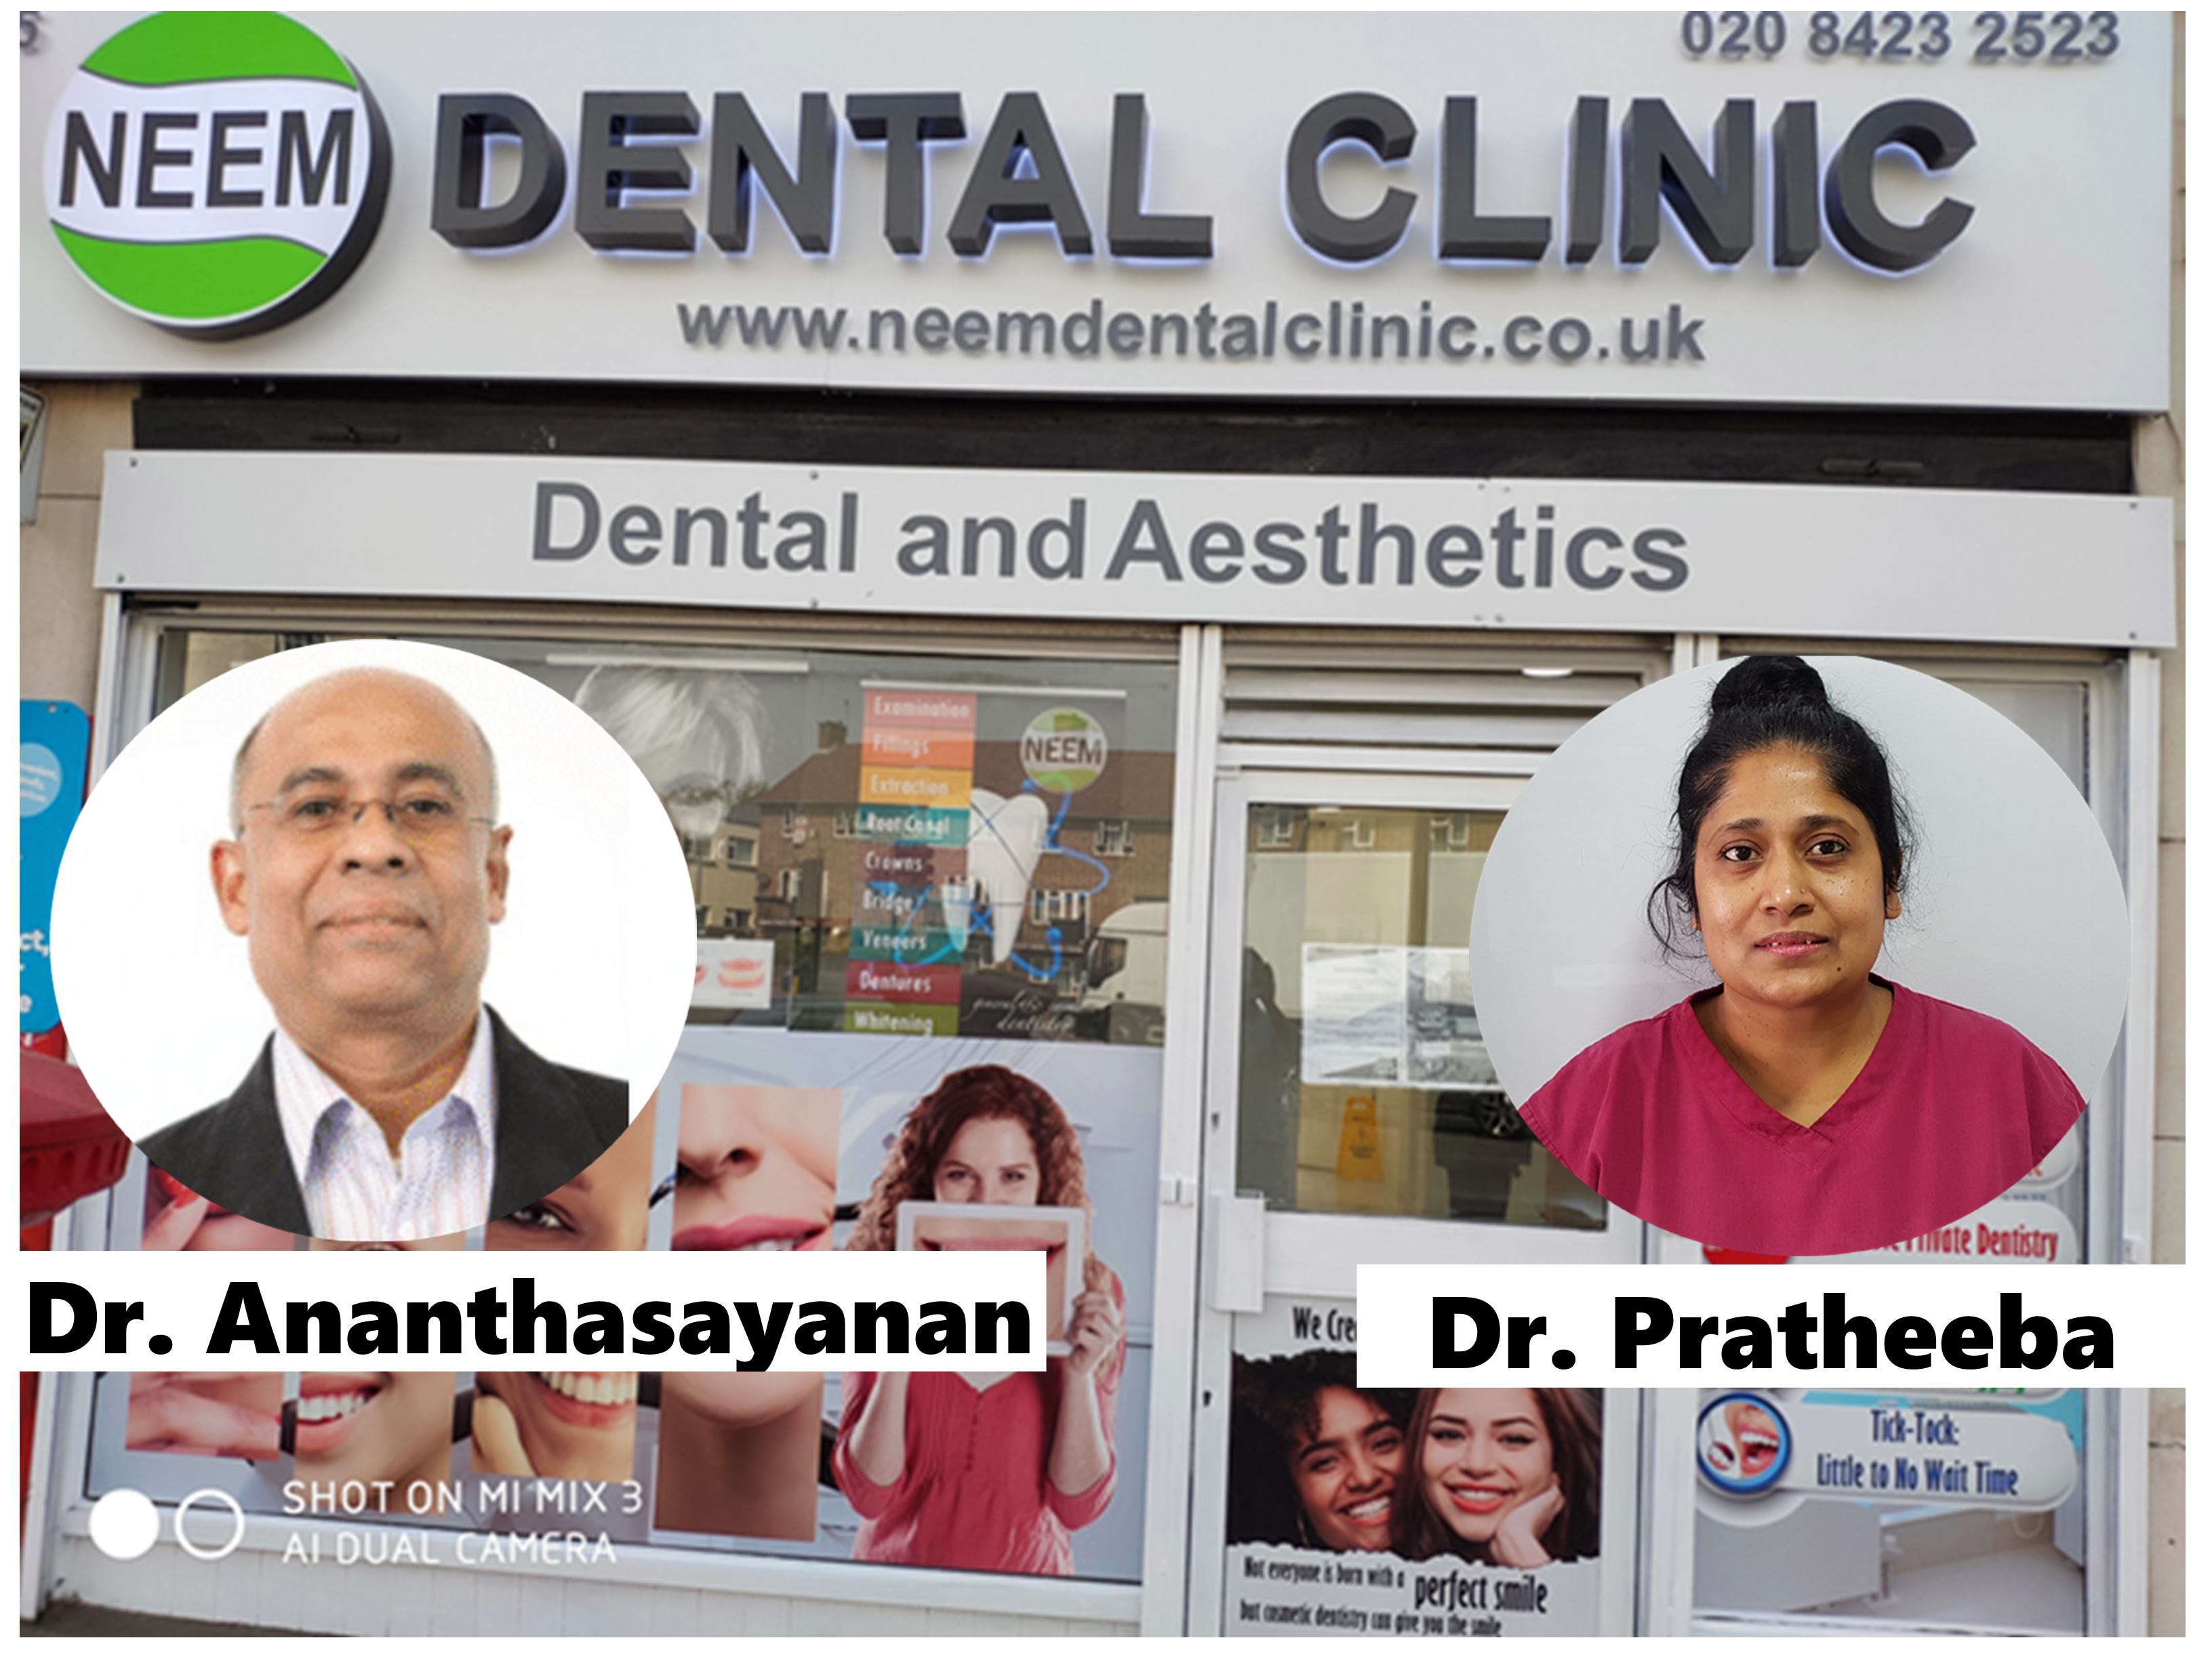 Your Dentist in Harrow